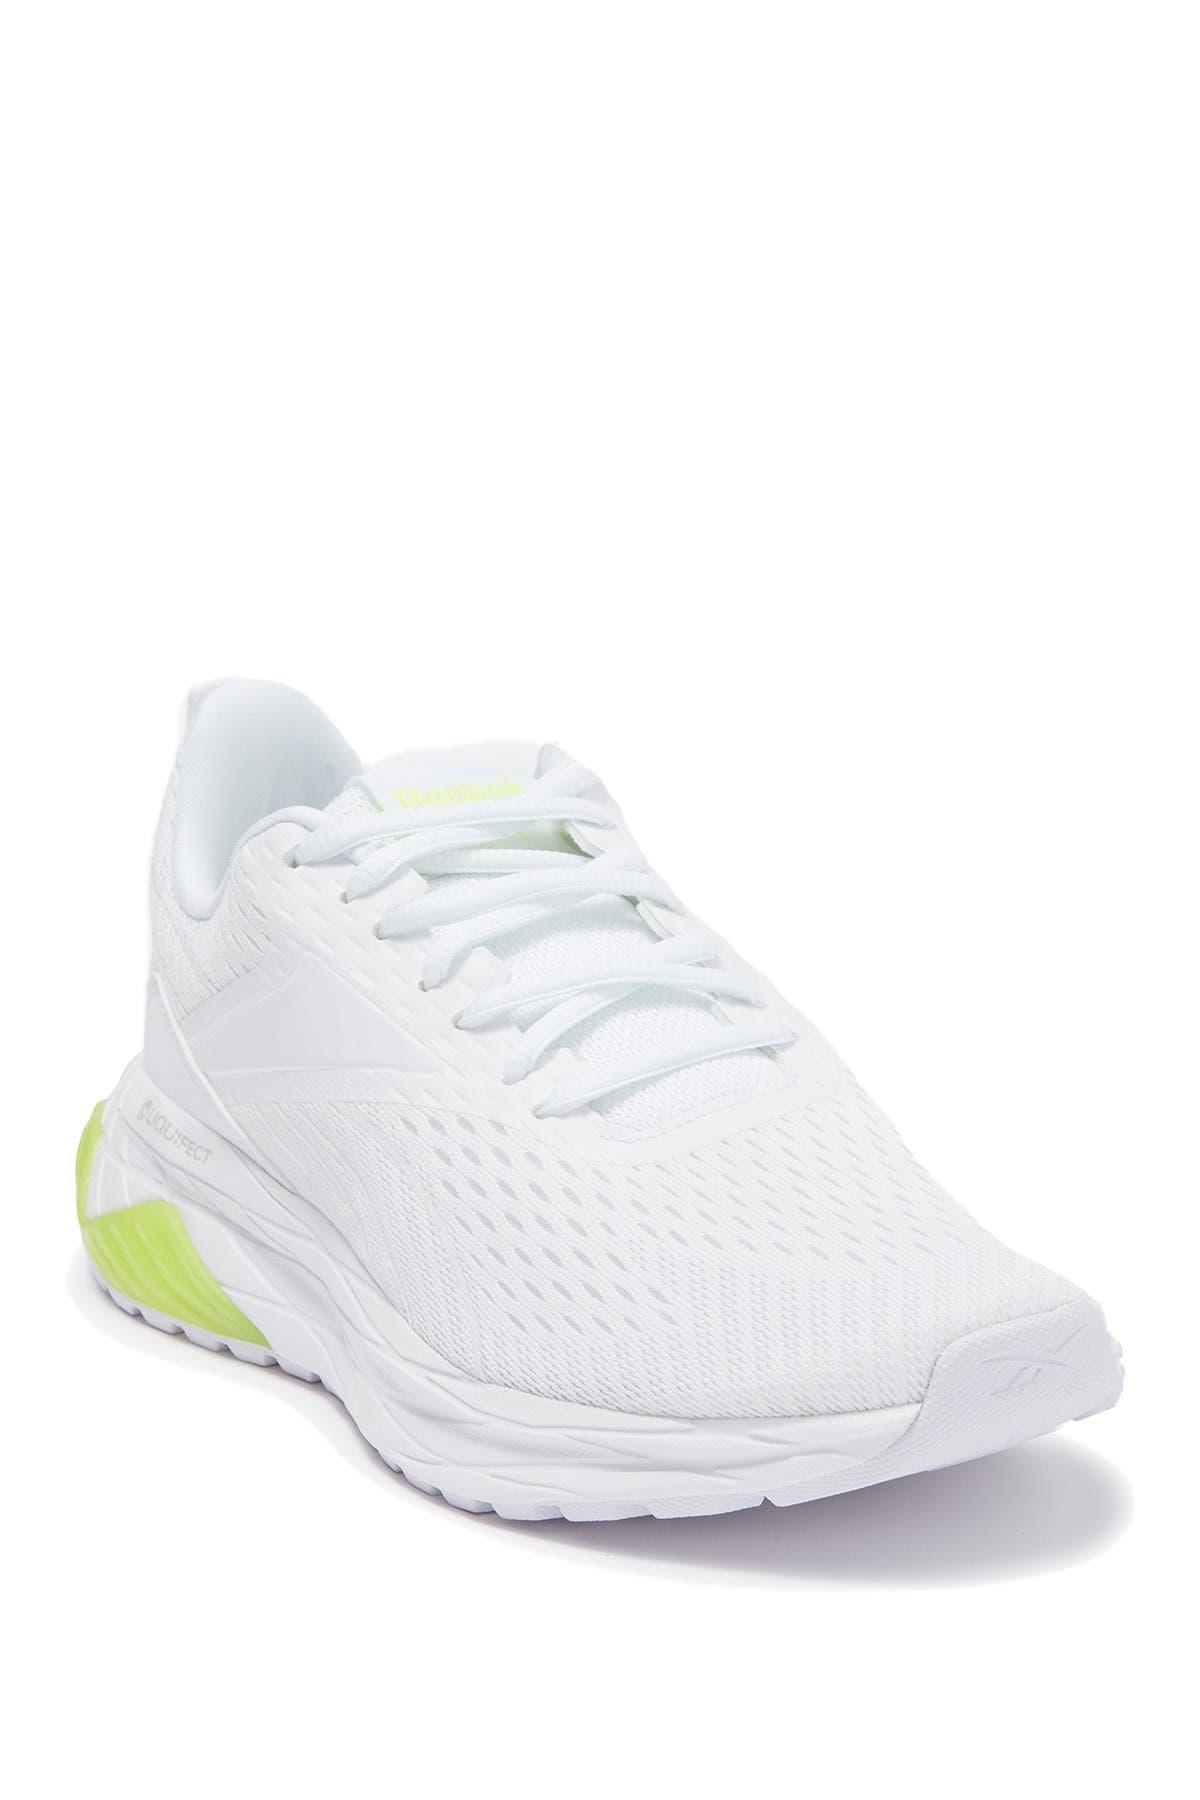 Image of Reebok Liquifect 180 2.0 SPT Running Shoe